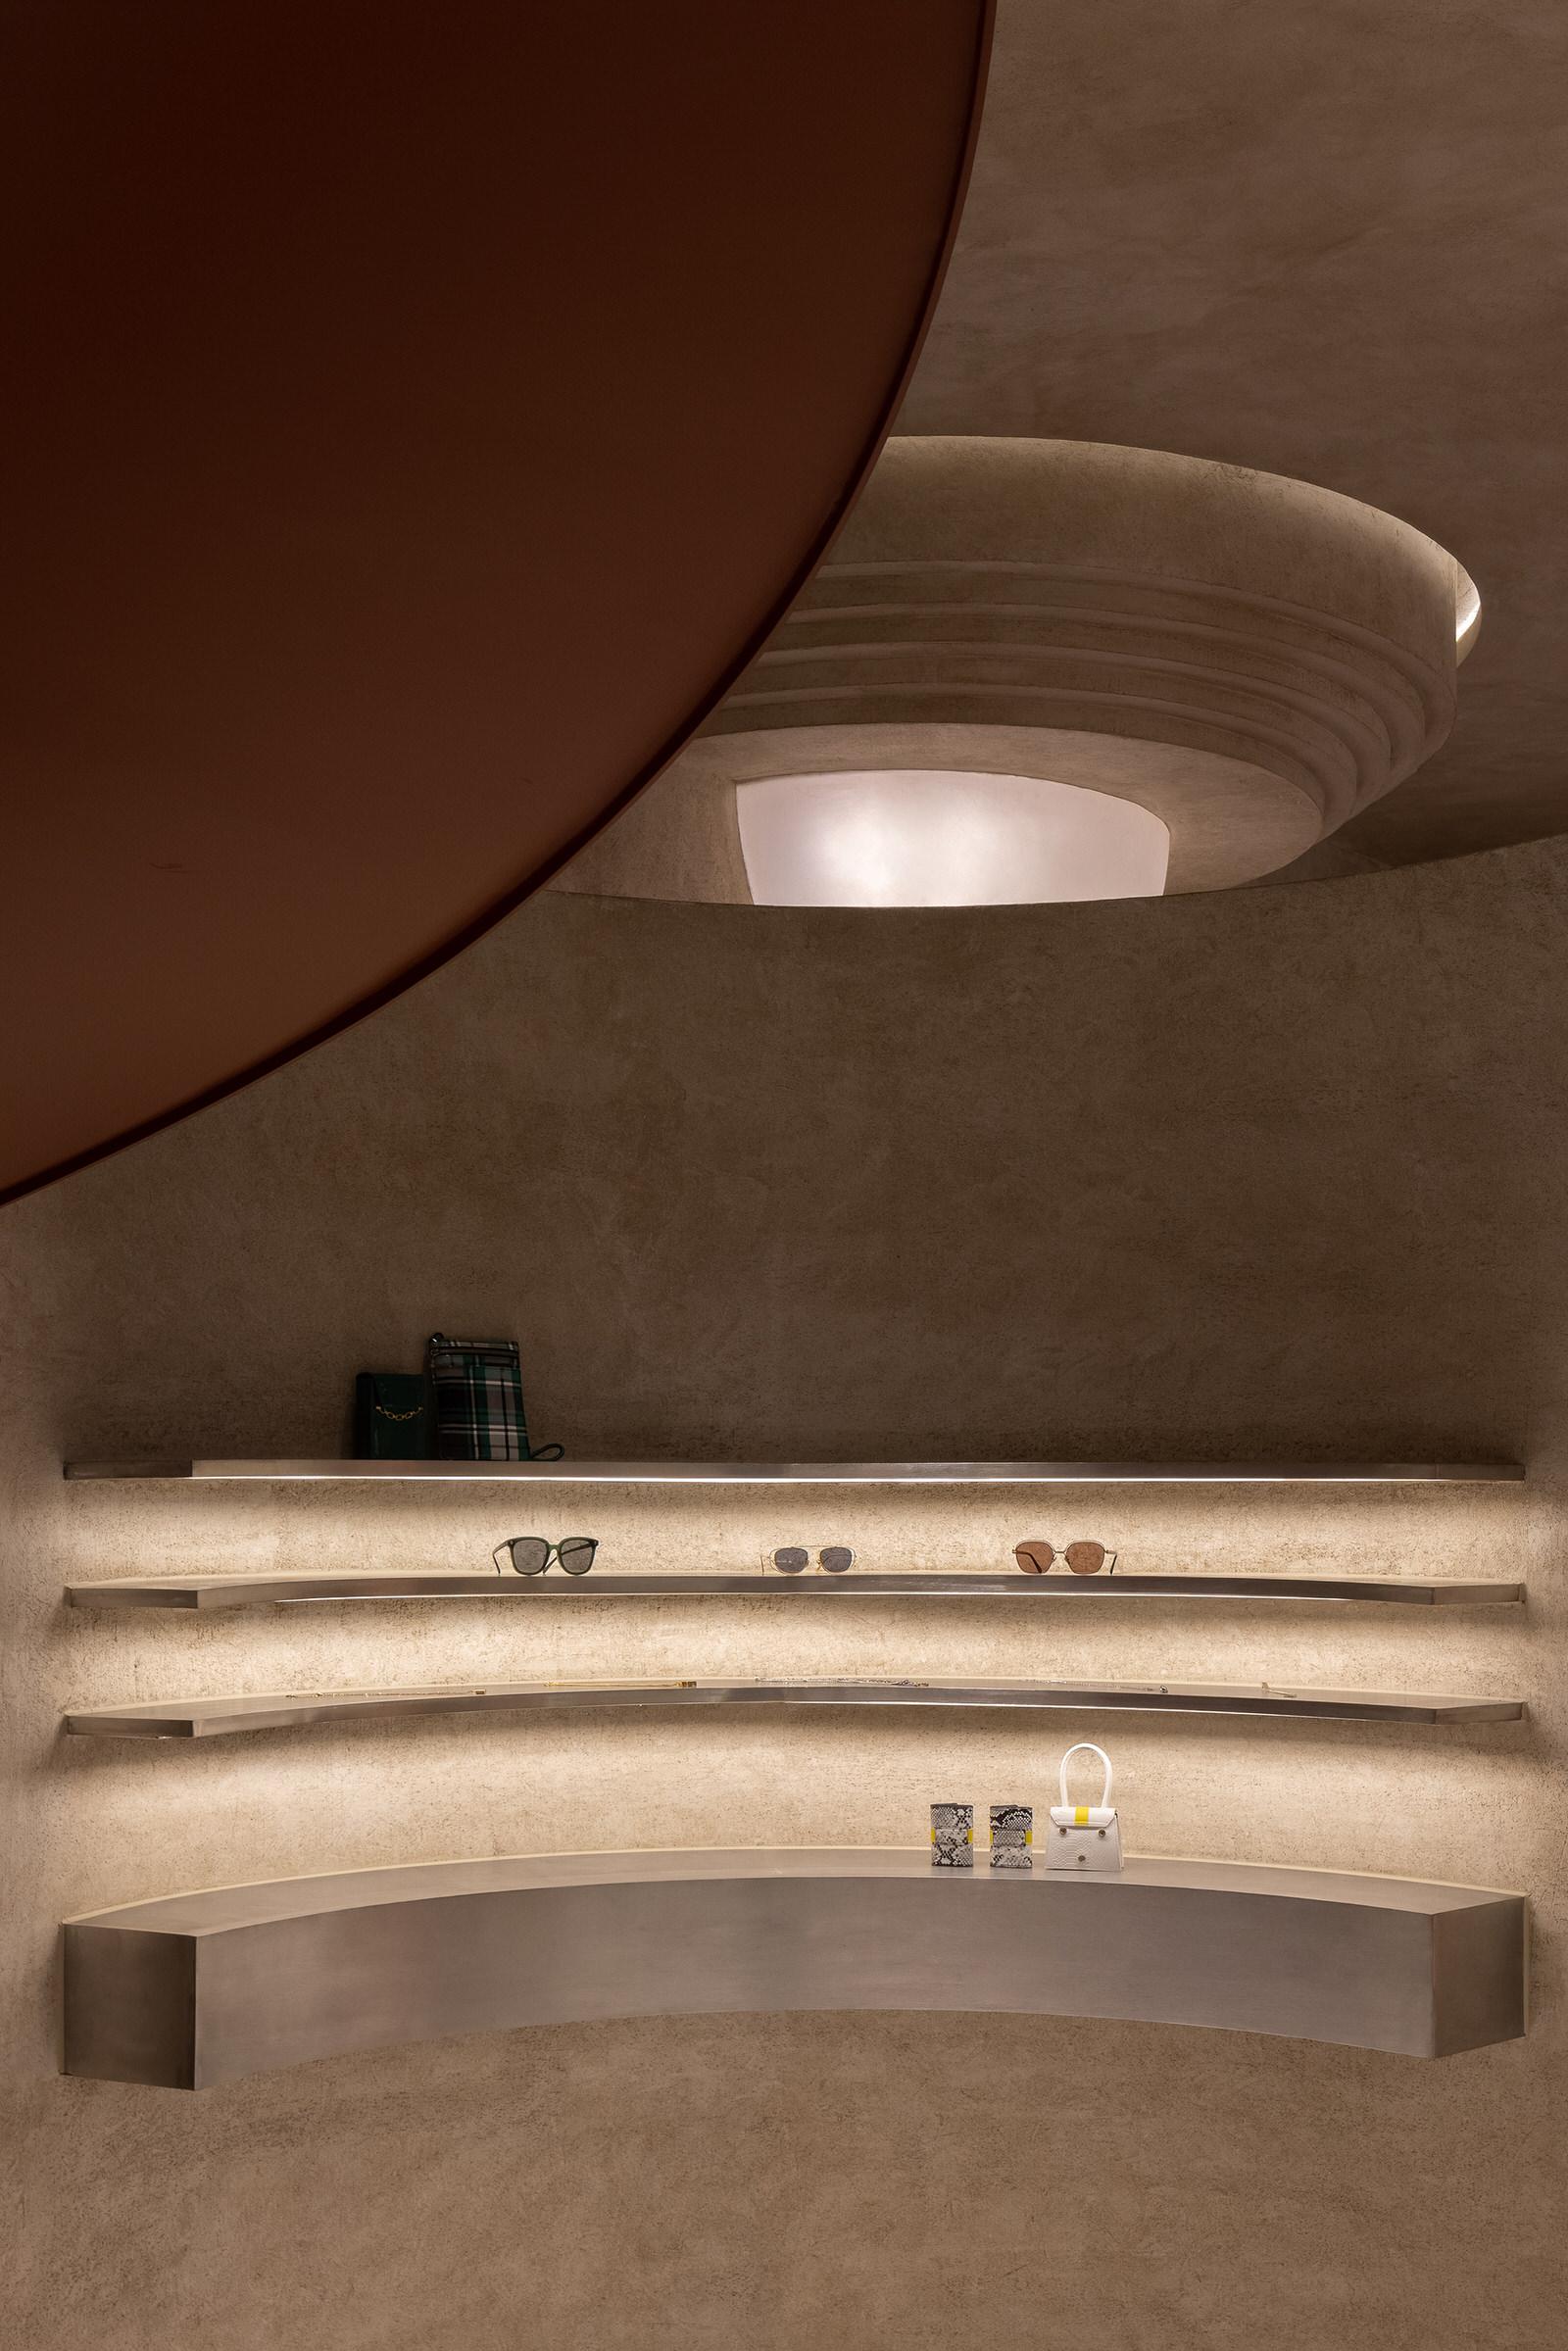 Liang Architecture Studio Audrey Boutique Hangzhou China Luxury Retail Photo Shao Feng Yellowtrace 28